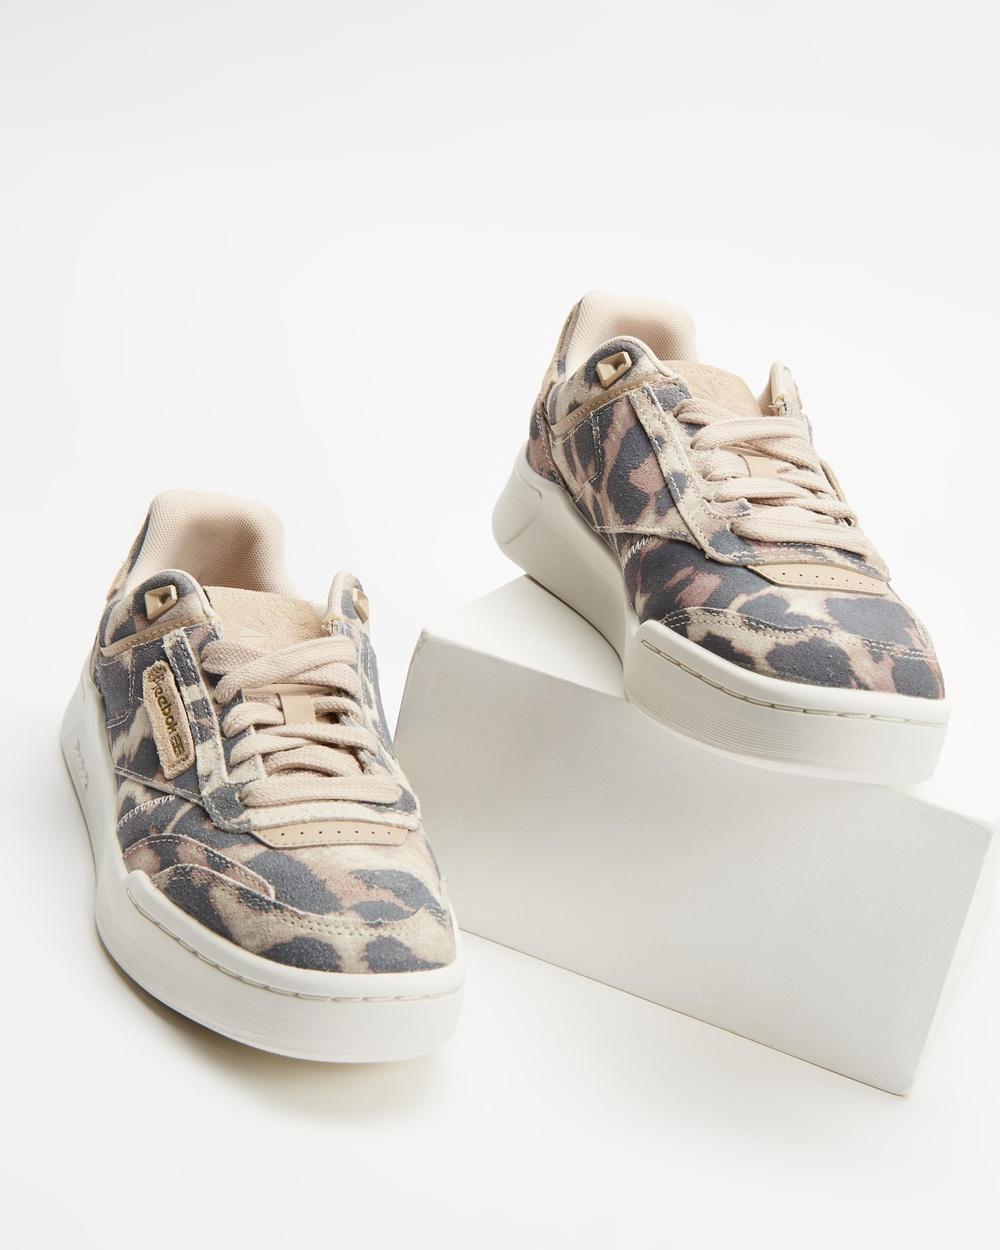 Reebok Club C Legacy Platform Shoes Women's Lifestyle Sneakers Modern Beige, Chalk & Stucco